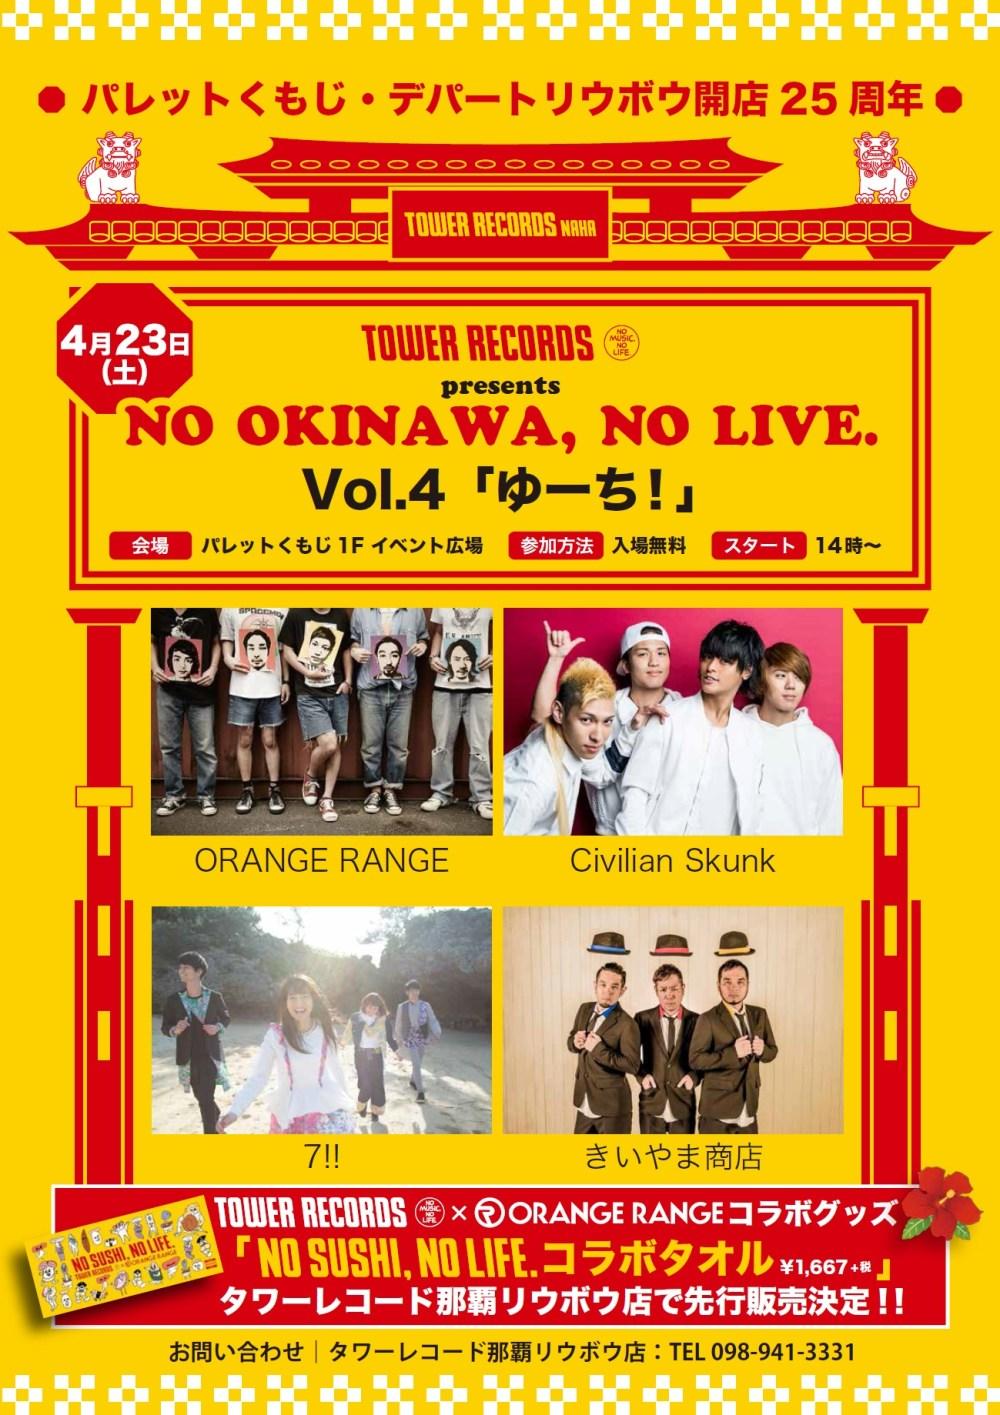 NO OKINAWA、NO LIVE.VOL.4「ゆーち」のフライヤー